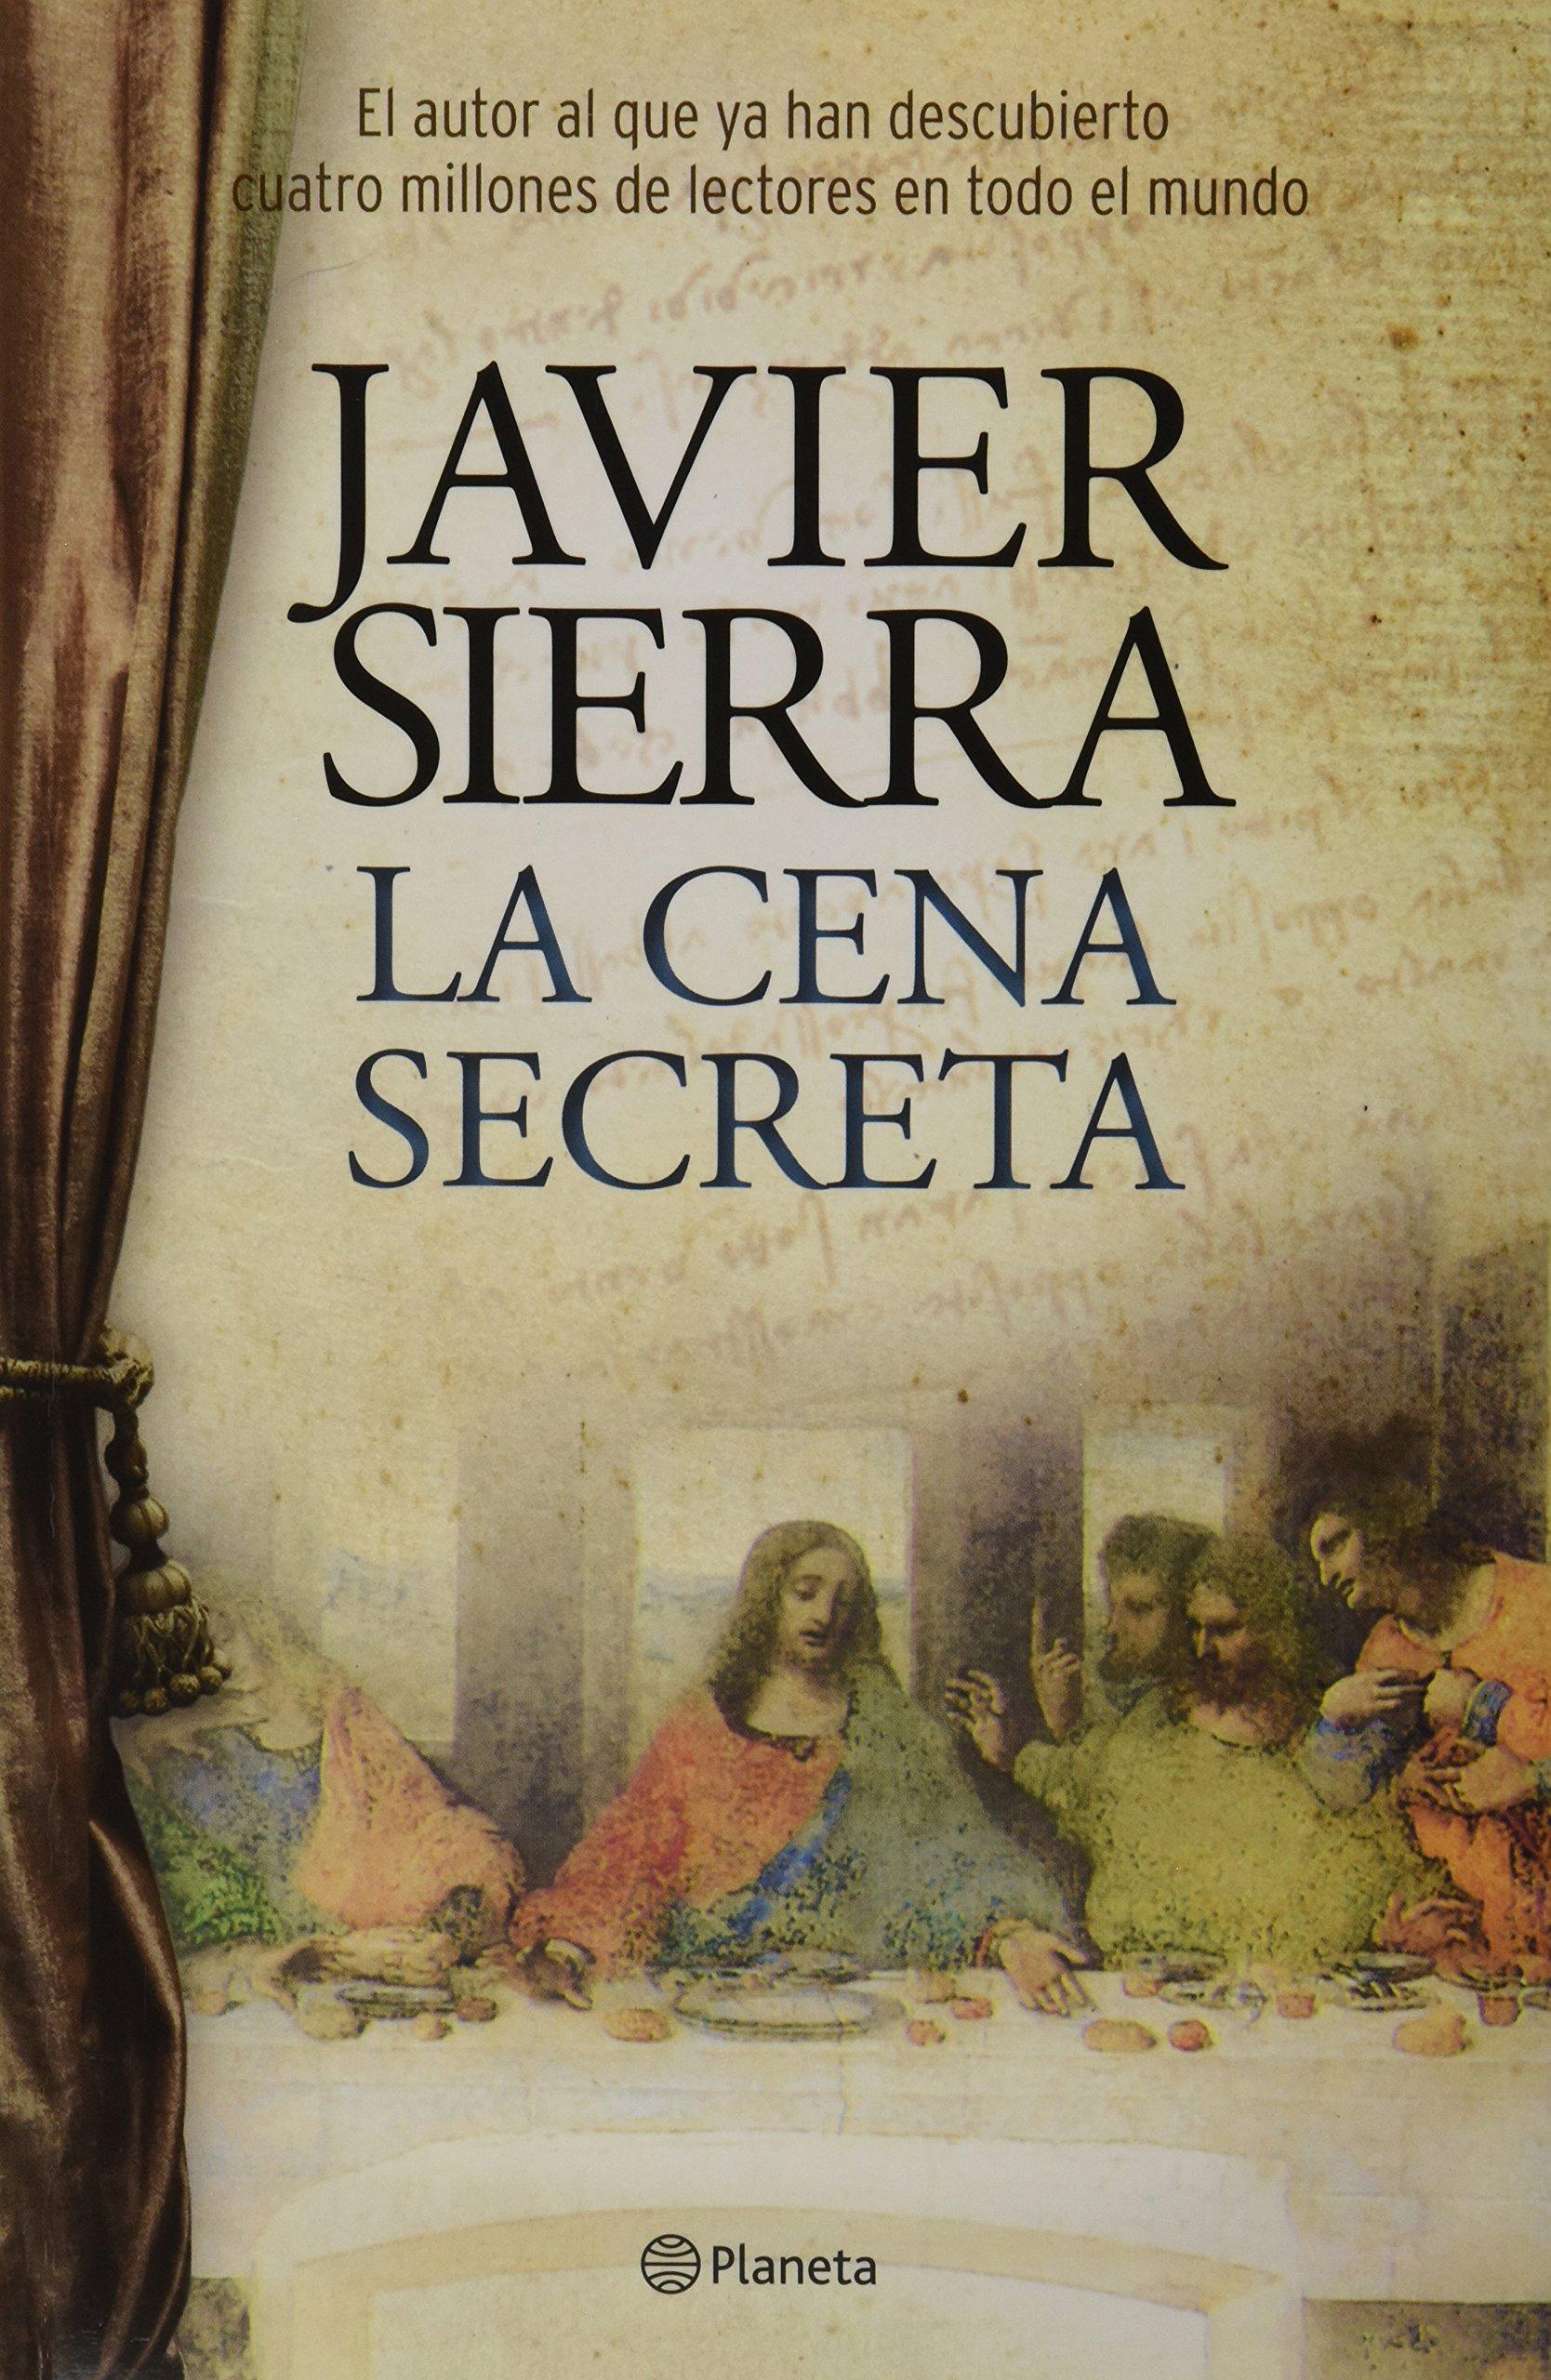 Cena secreta, La: Amazon.es: Libros